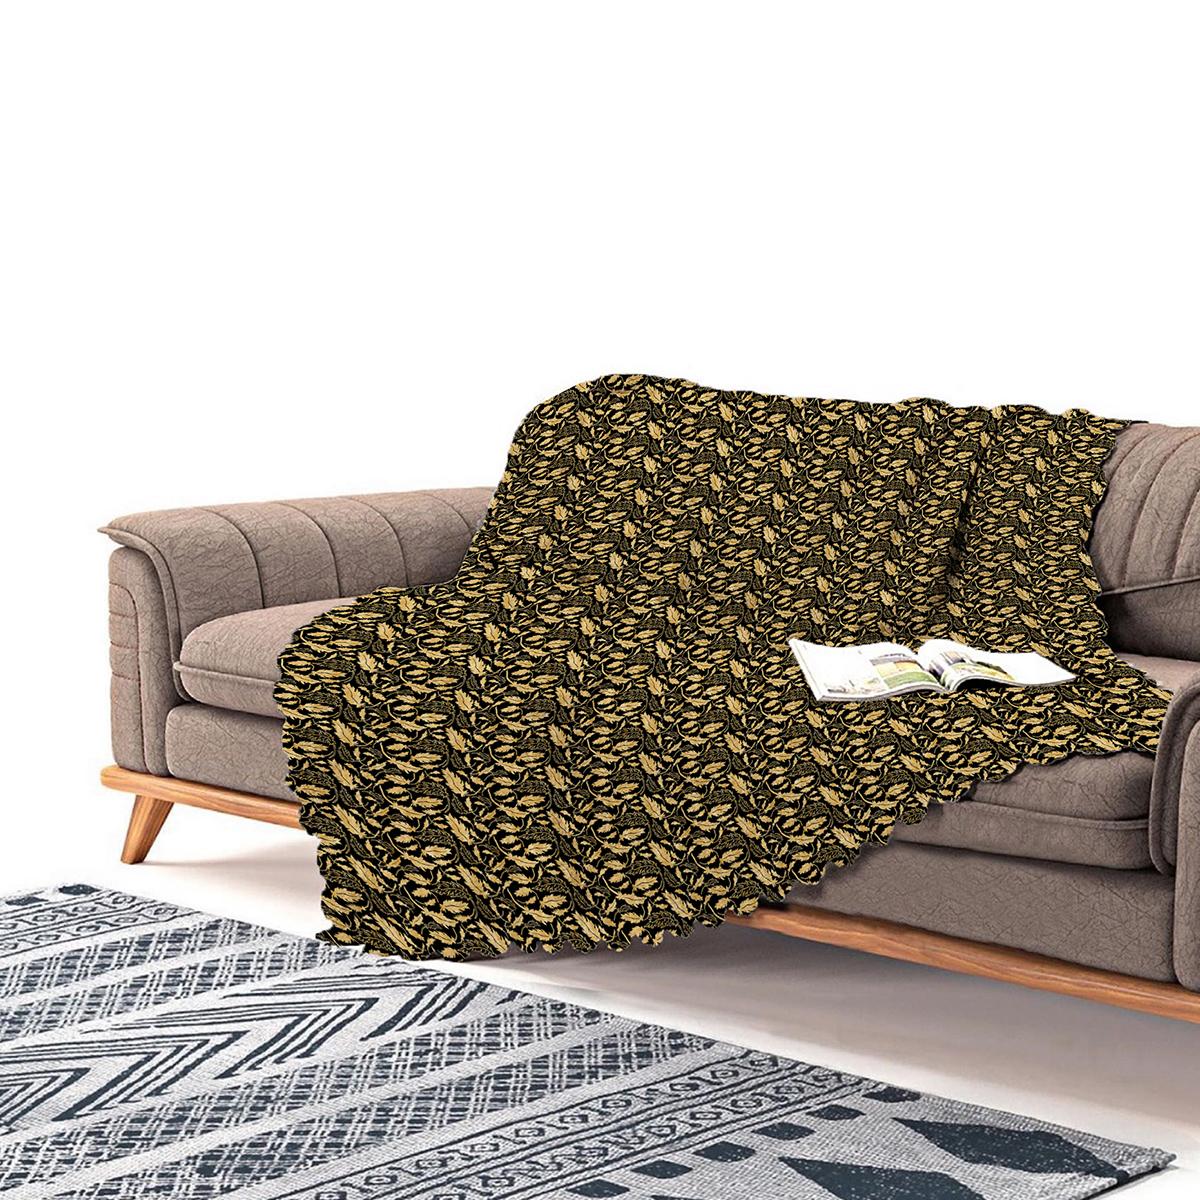 Realhomes Siyah Zeminli Altın Yapraklar Motifli Modern Şönil Koltuk Örtüsü Realhomes